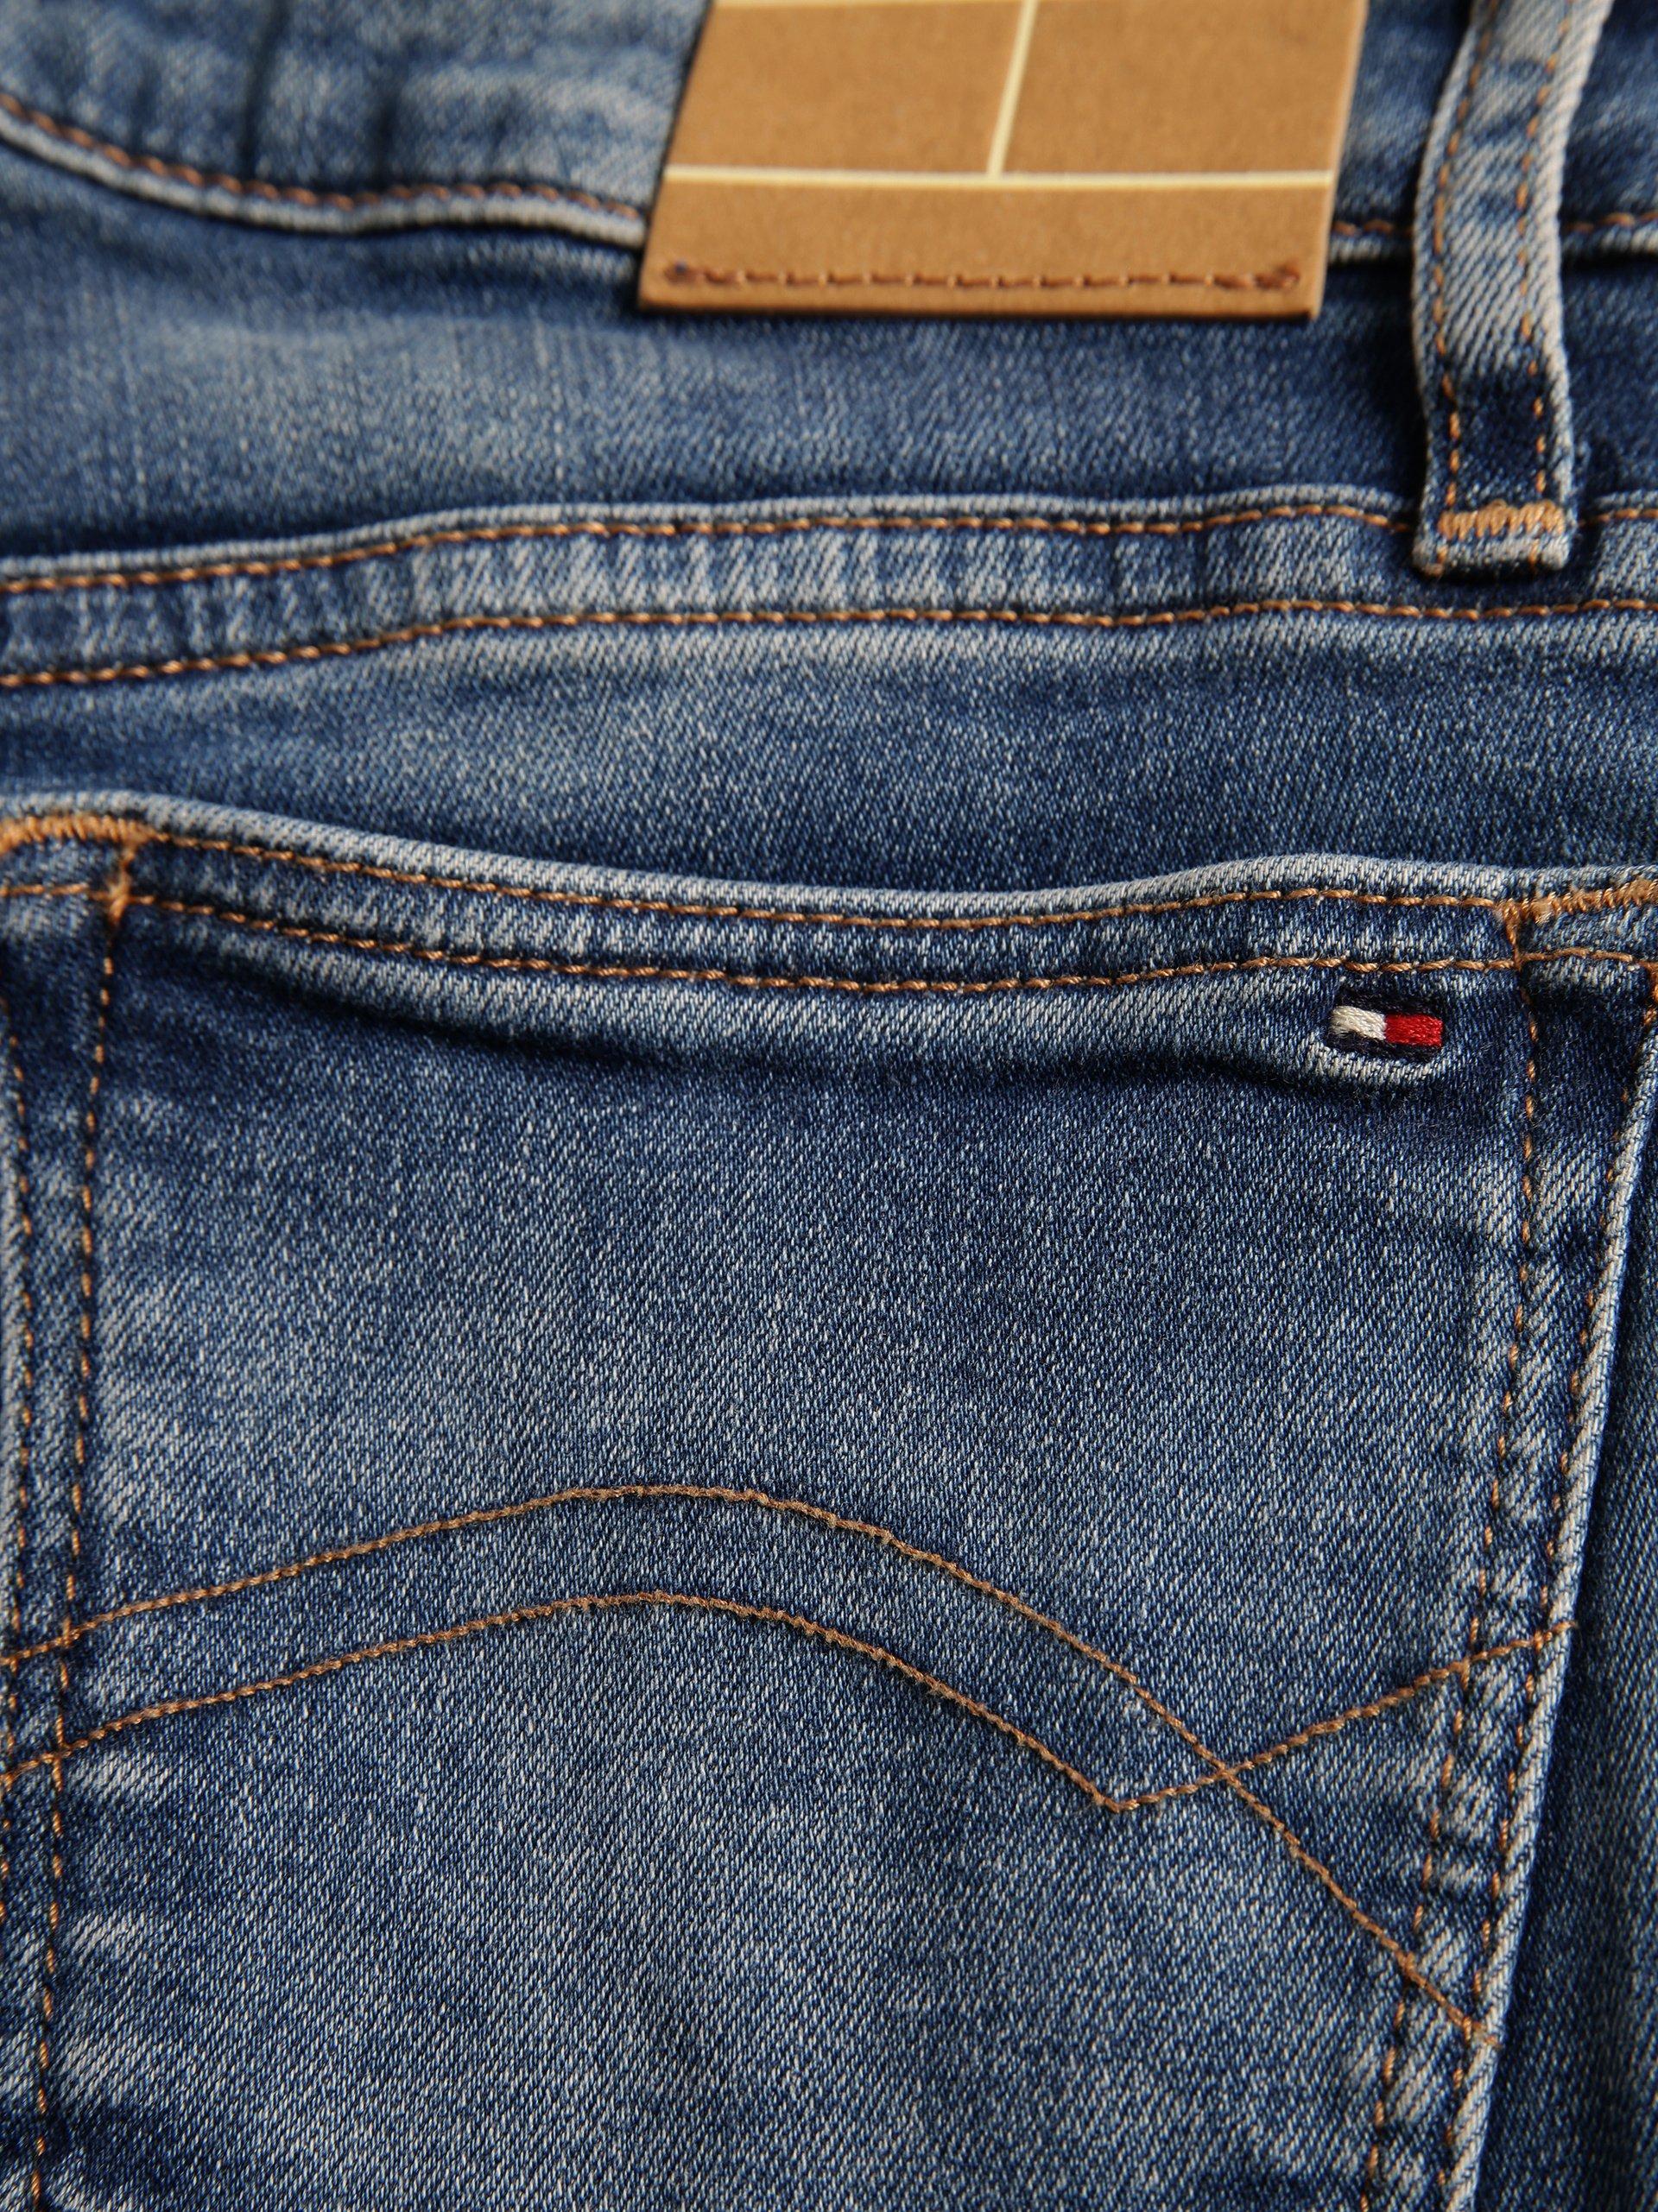 Tommy Hilfiger Mädchen Jeans Skinny Fit - Nora